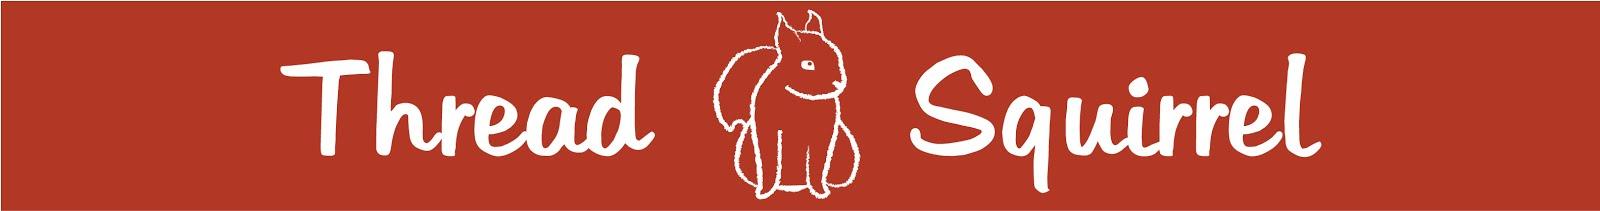 Thread Squirrel